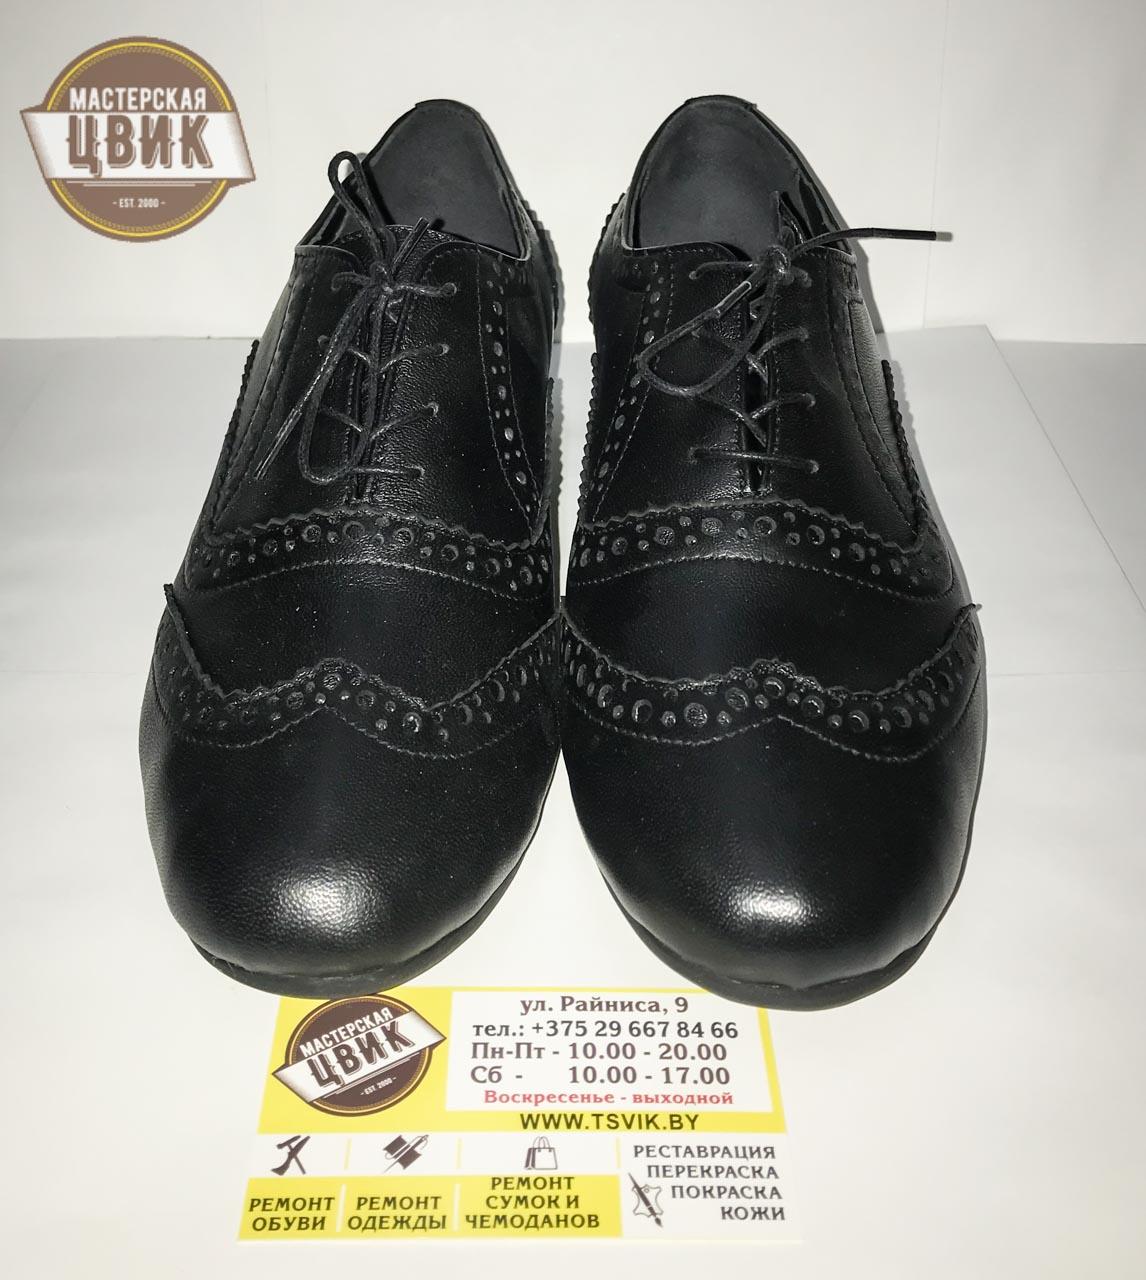 individualnyj-poshiv-obuvi-minsk-8 Индивидуальный пошив обуви Минск-8